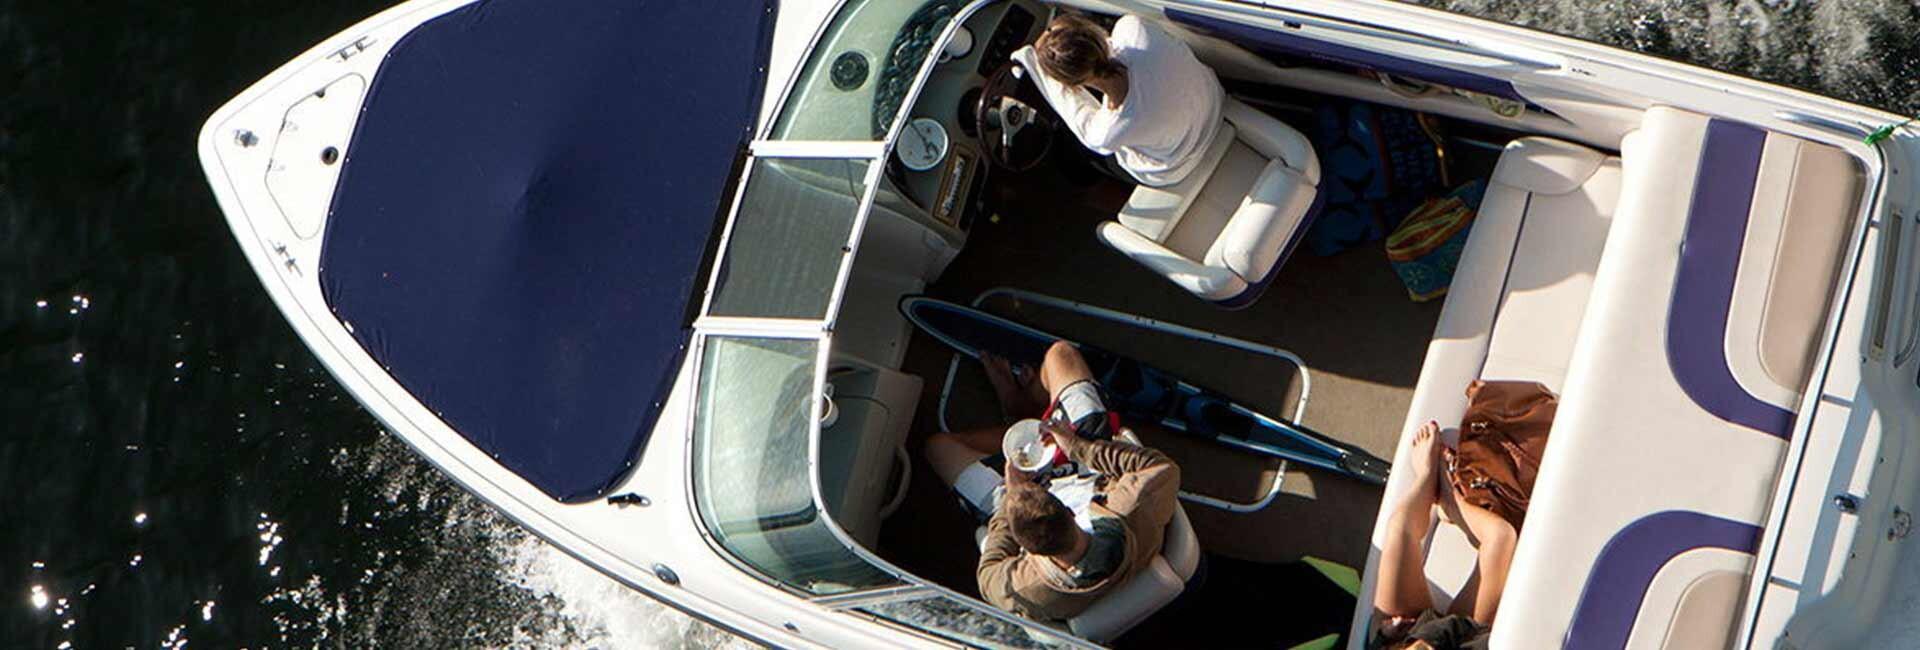 Couple boating